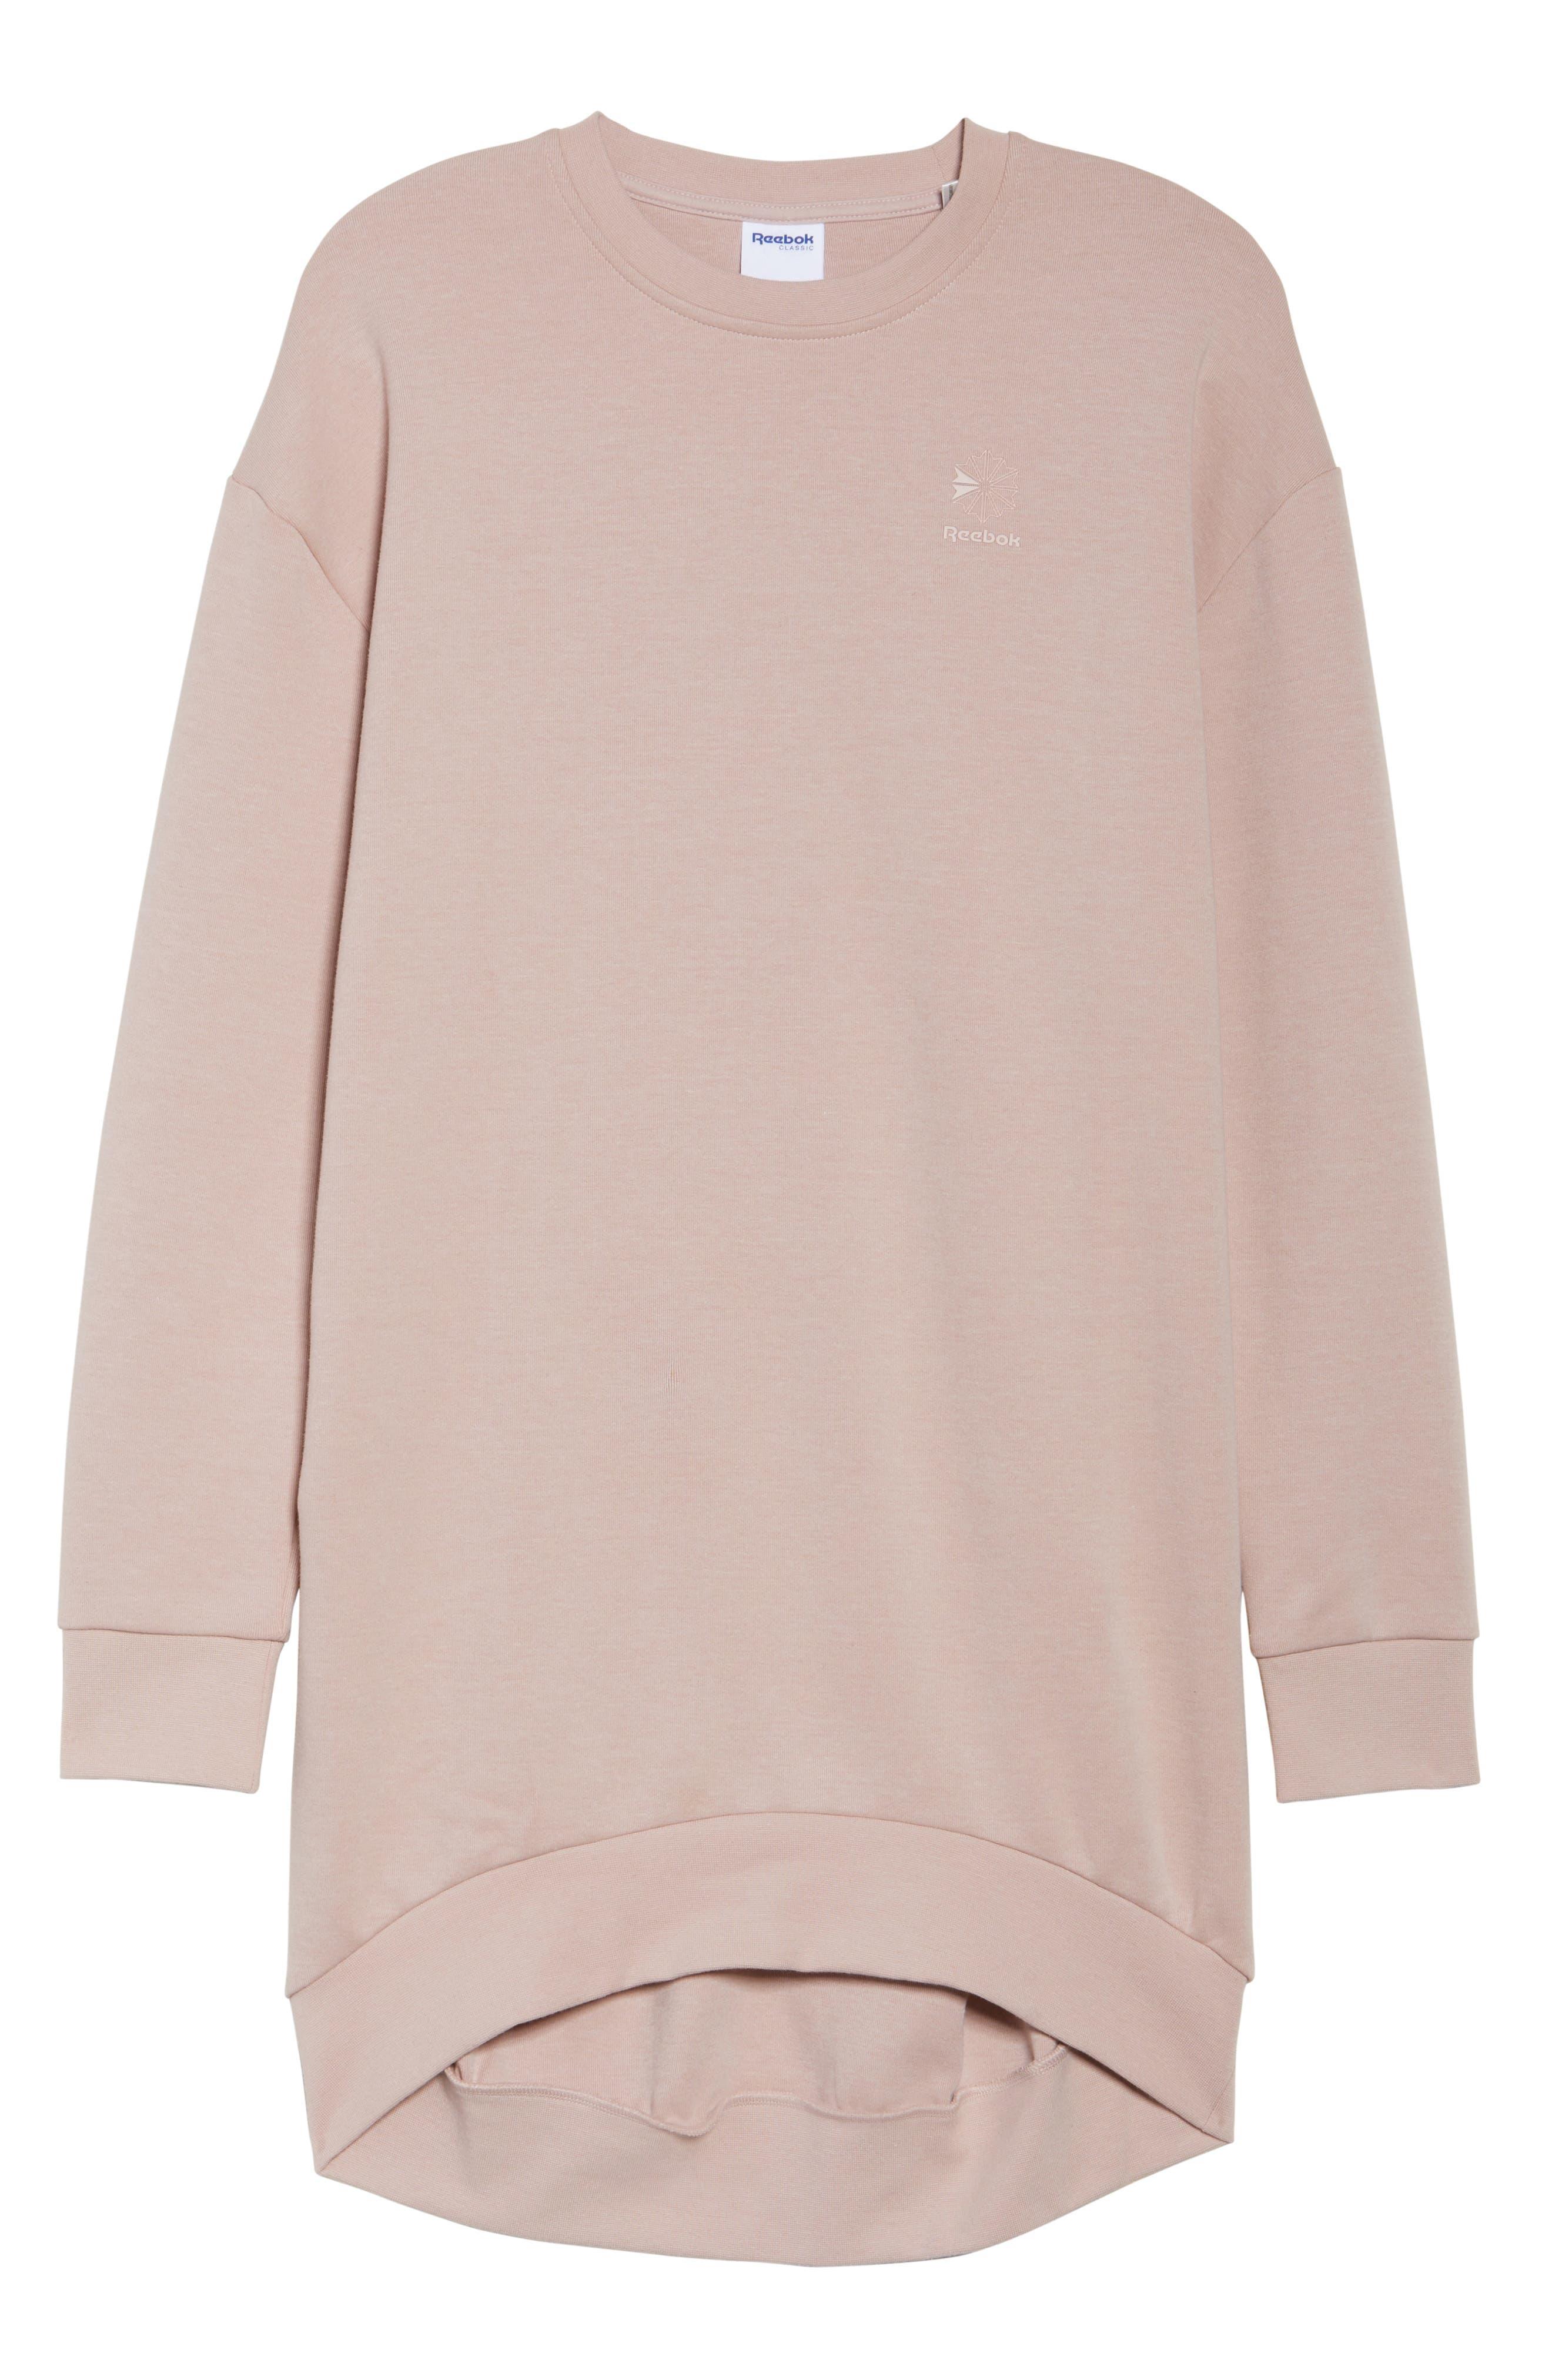 Alternate Image 1 Selected - Reebok Oversized Sweatshirt